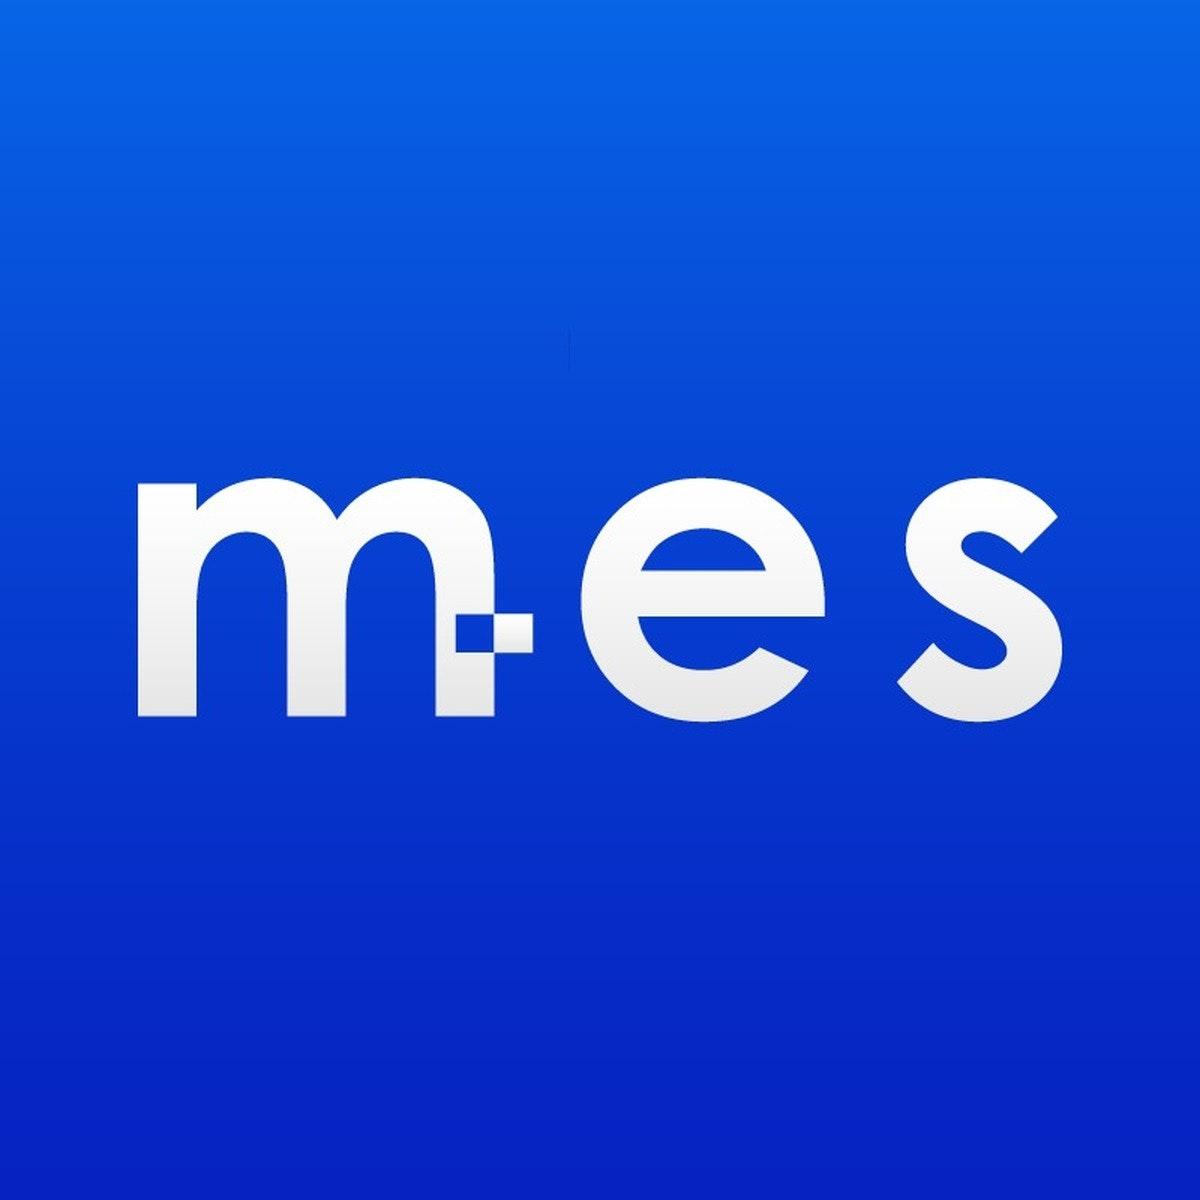 MediaEvent Services GmbH & Co. KG